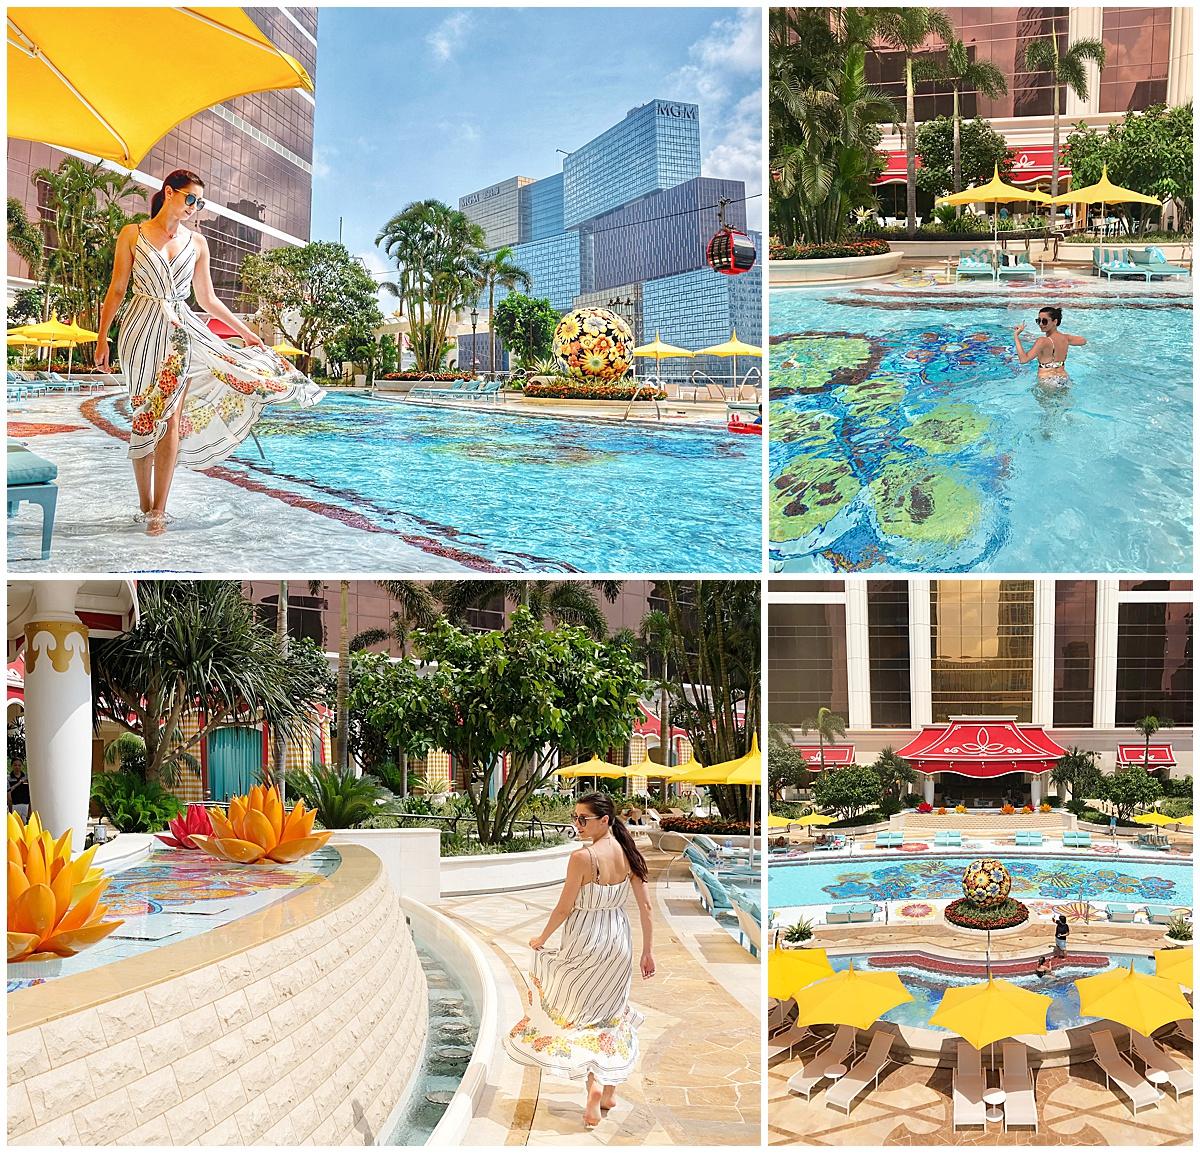 Wynn Palace Swimming Pool